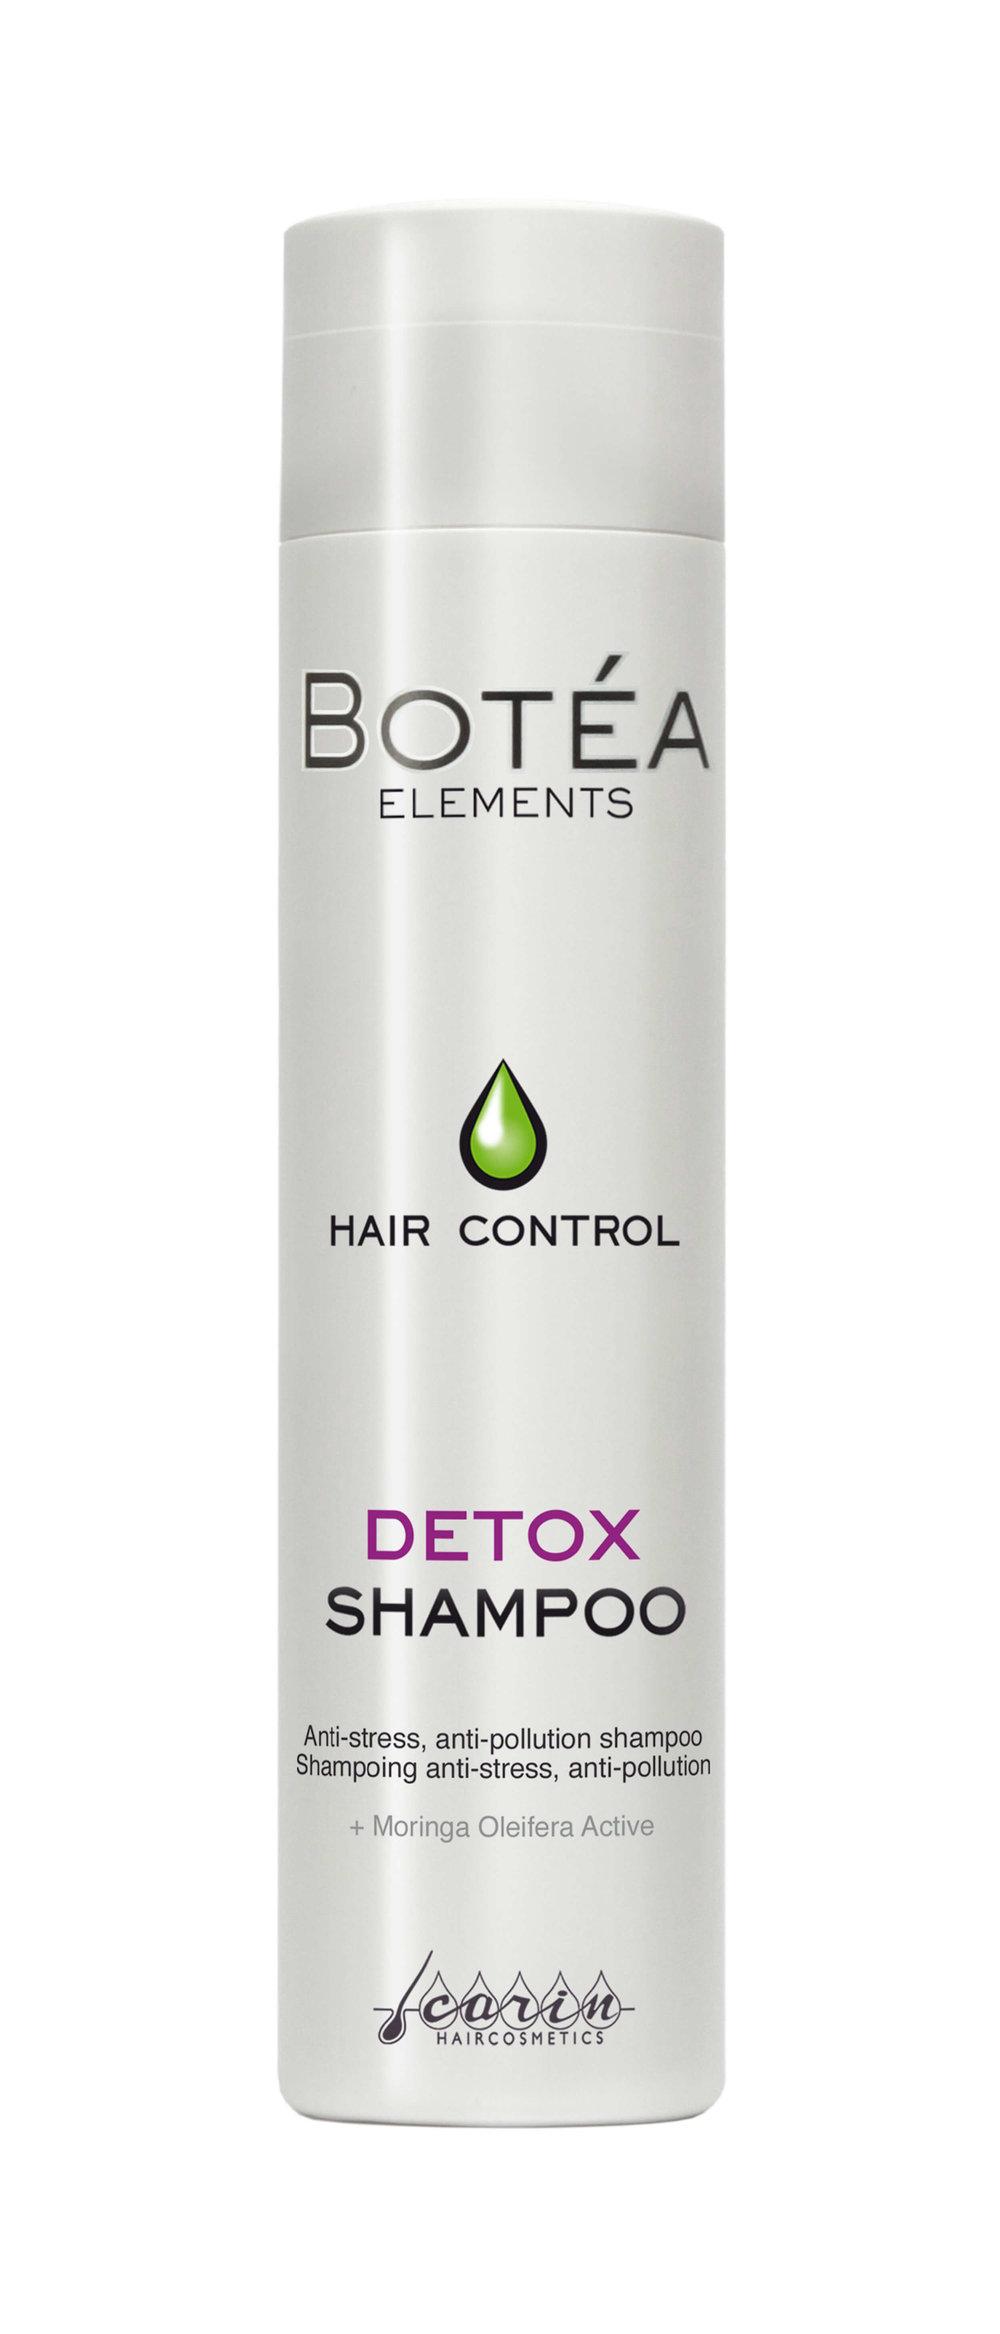 Echos-Coiffure-produit-Carin-Haircosmetics-Shampooing-Botea-Elements-Detox.jpg